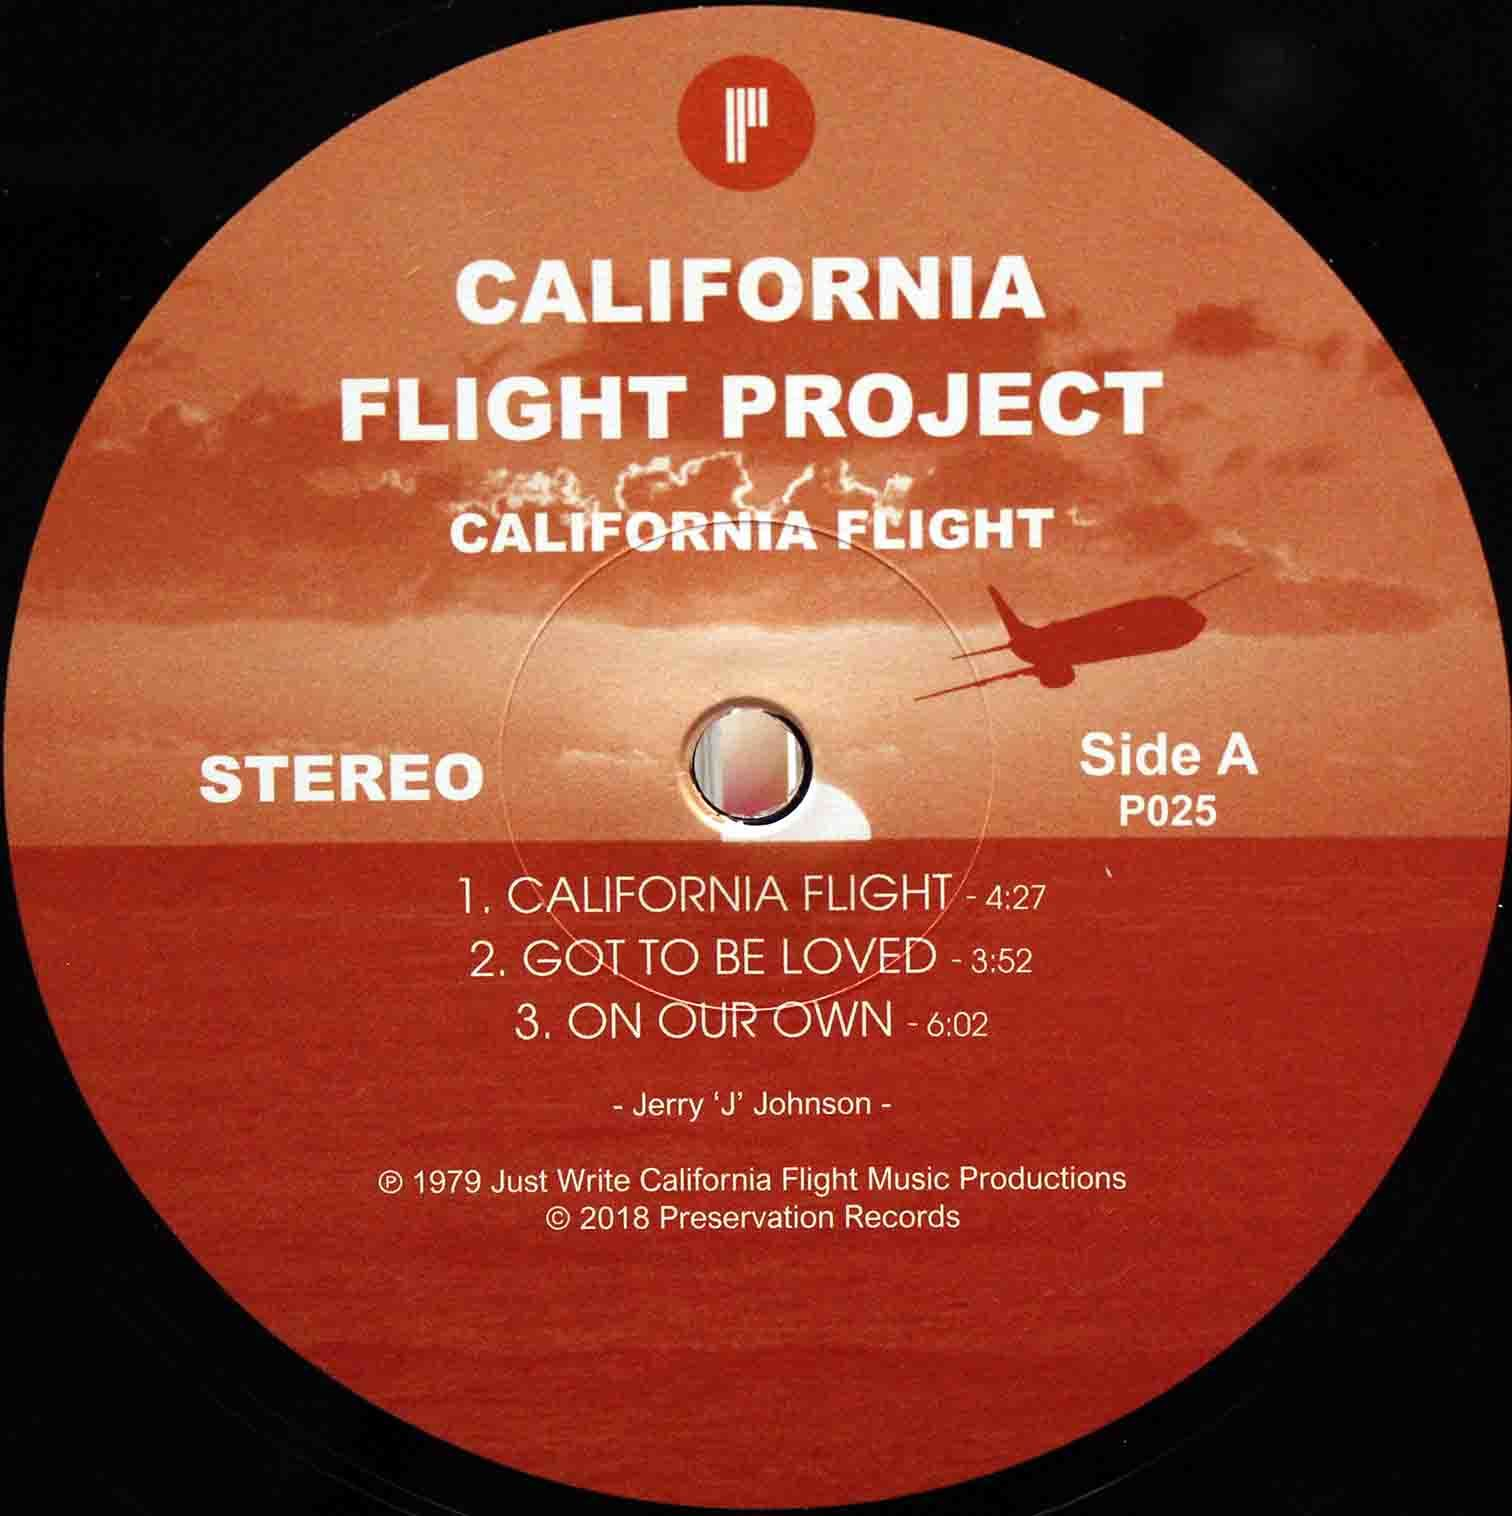 California Flight Project 03